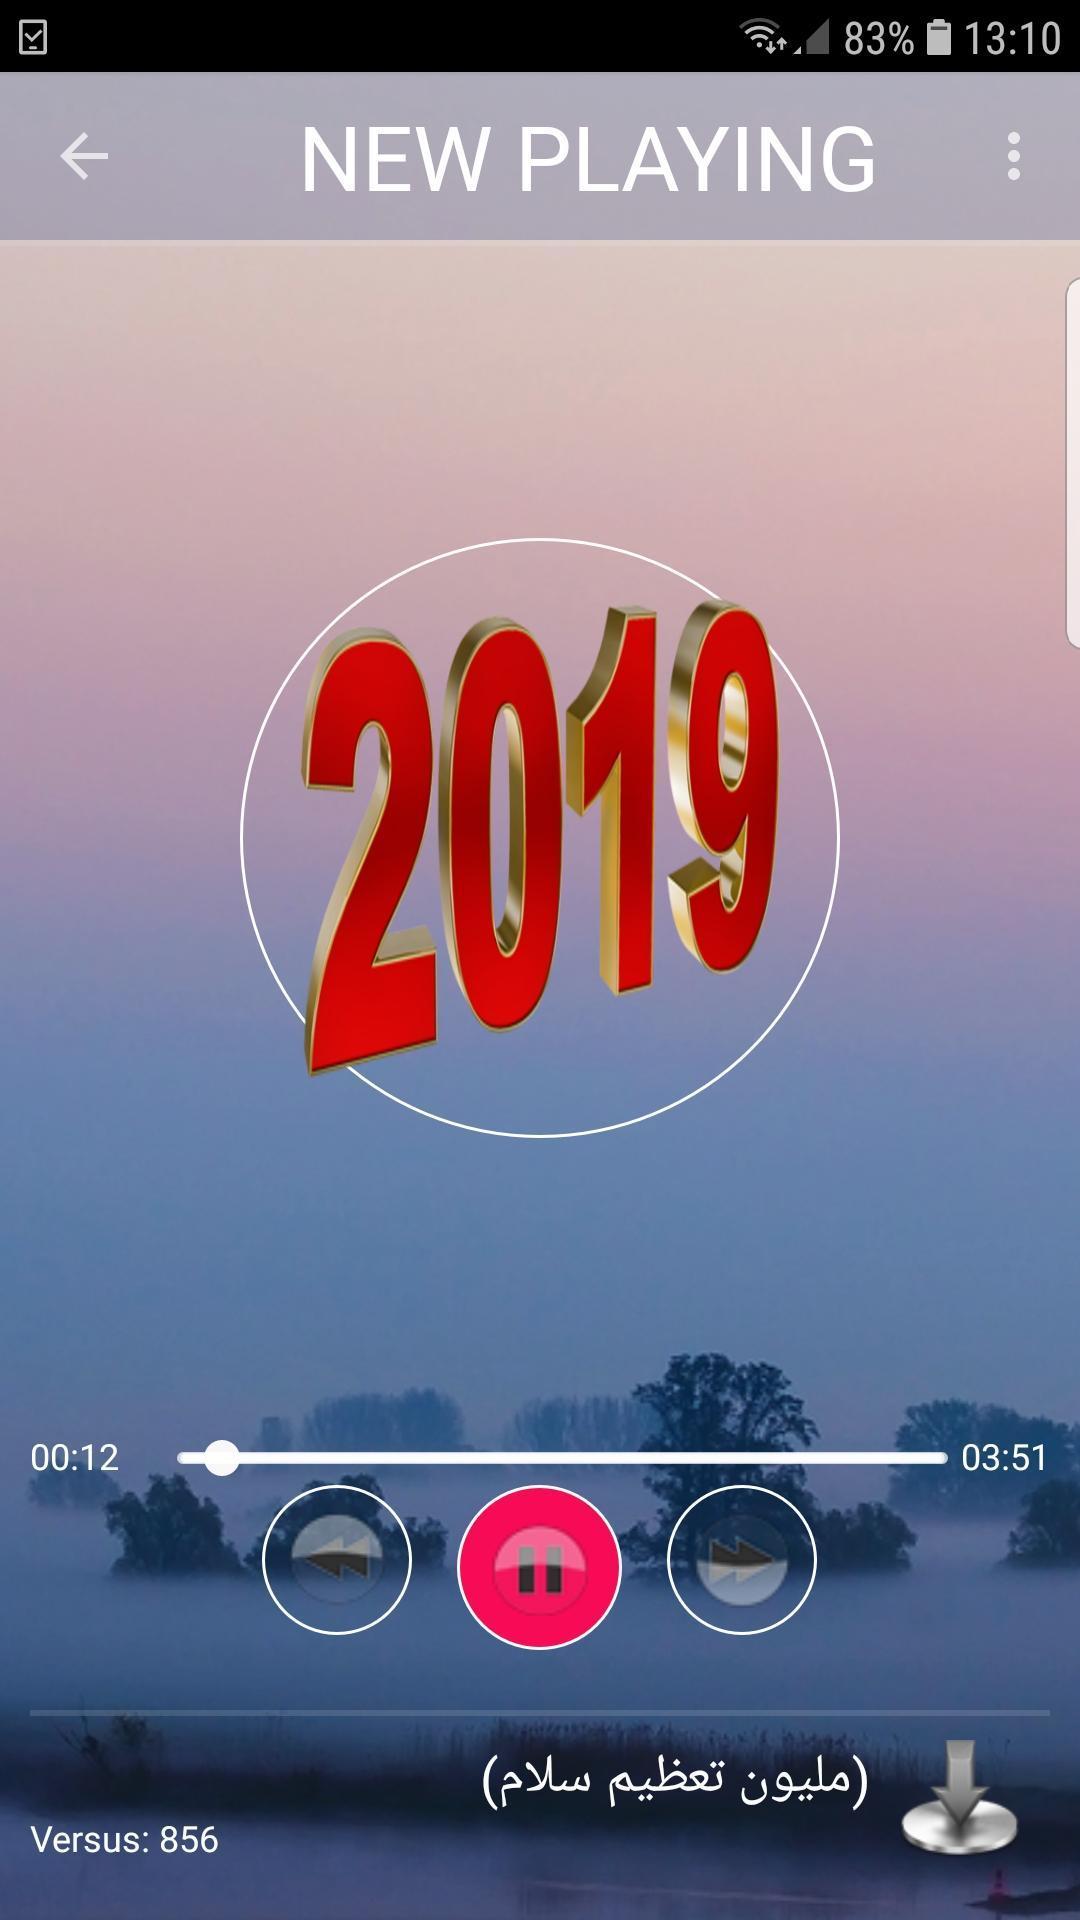 GRATUITEMENT CHARKIA MP3 TÉLÉCHARGER AGHANI